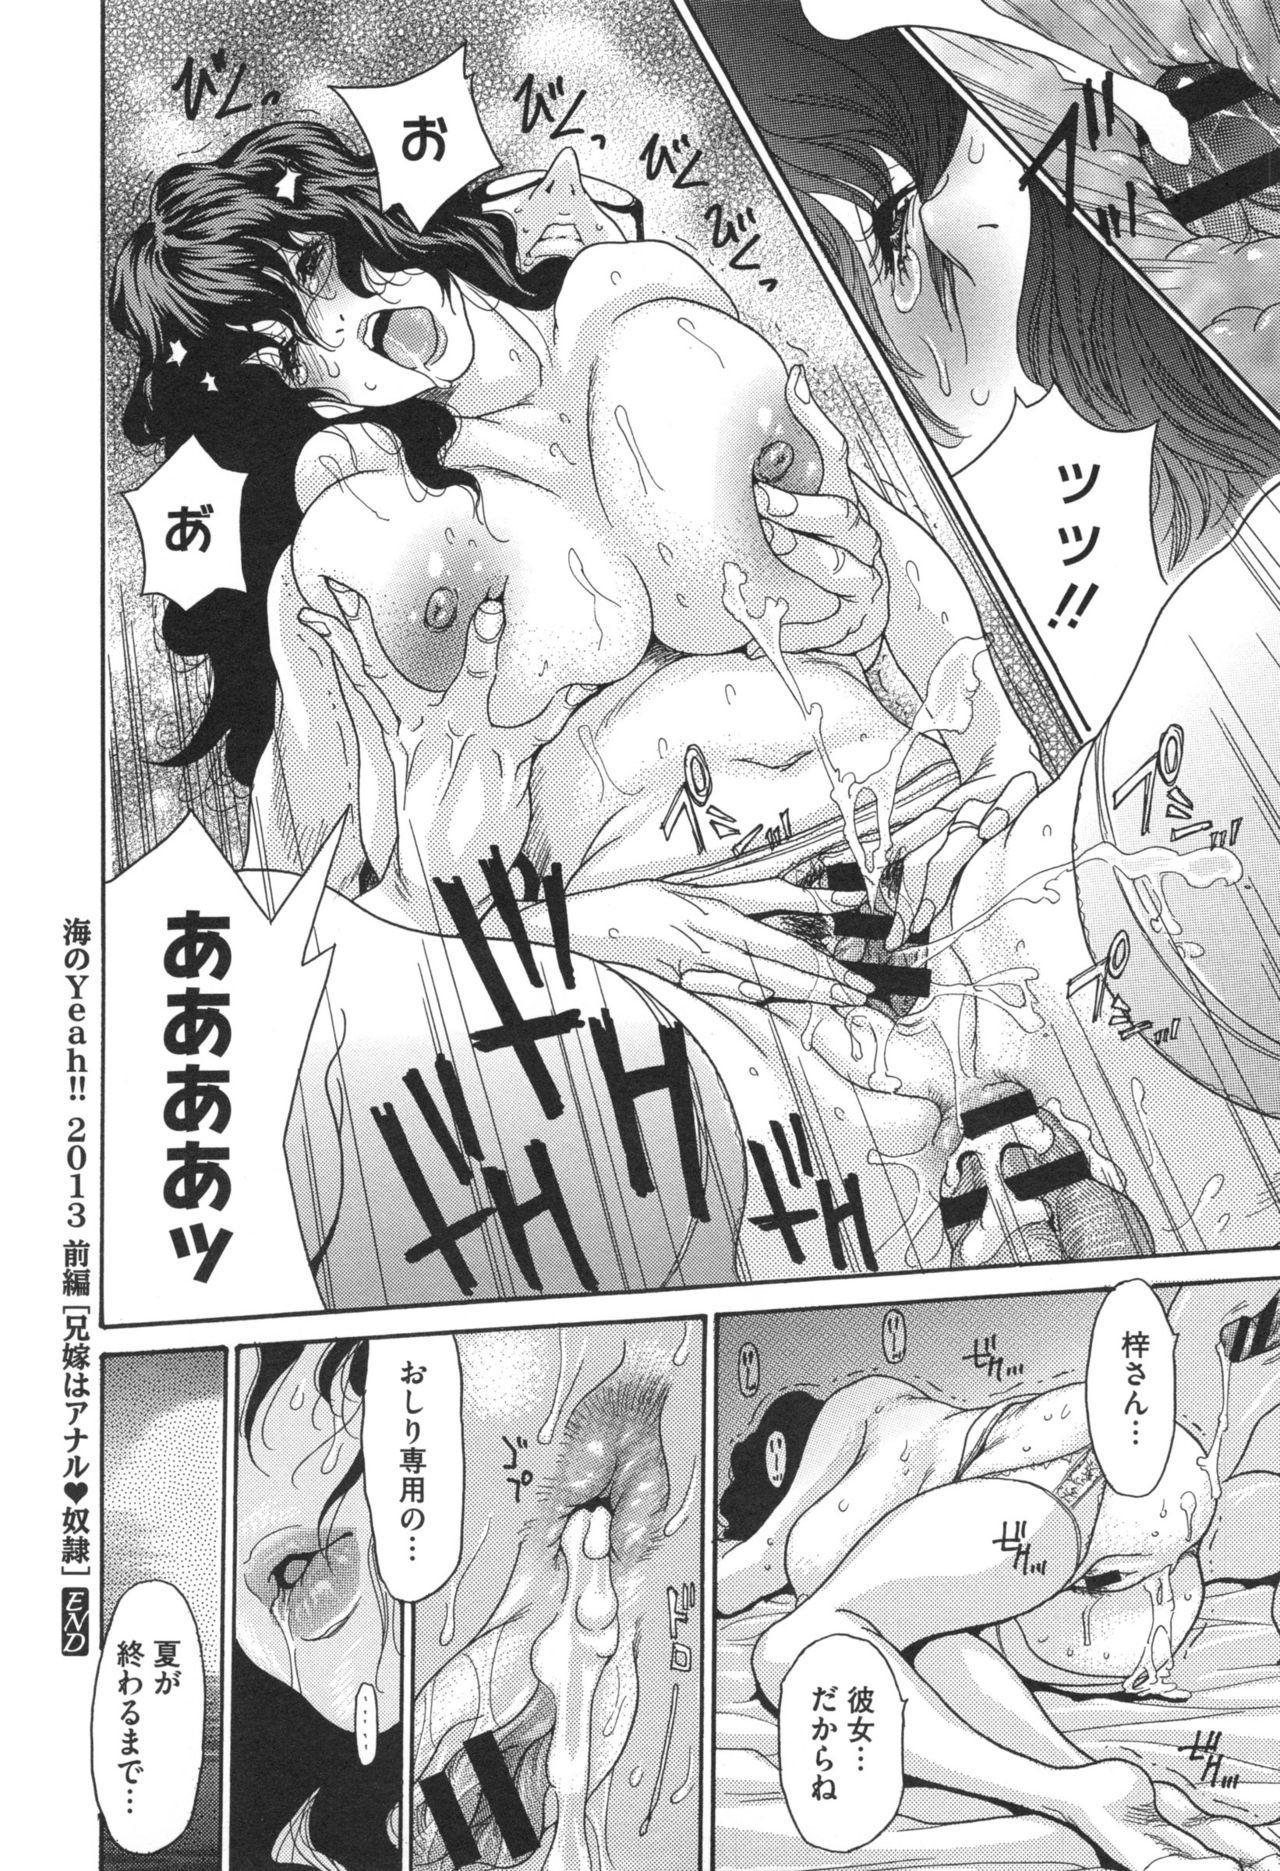 Niku-zuma Netorare Maniacs 108